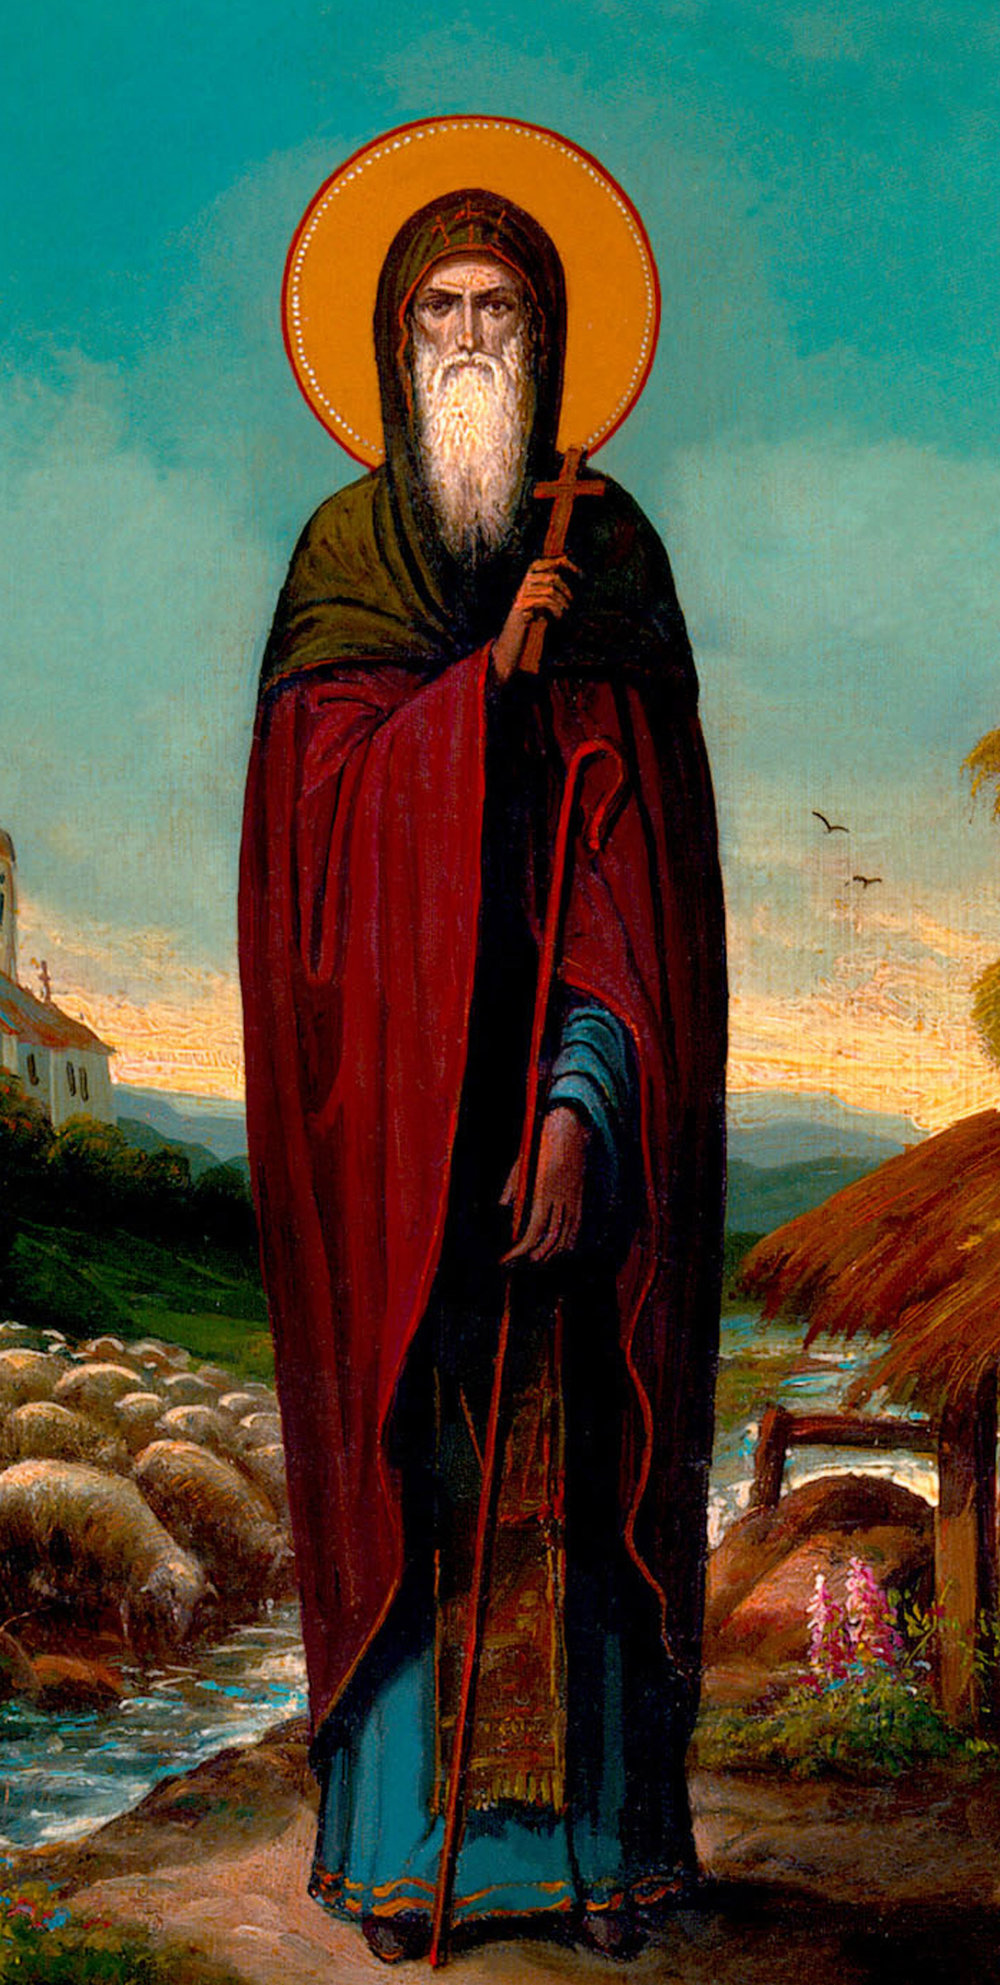 Sfântul Dimitrie cel Nou—Basarabov